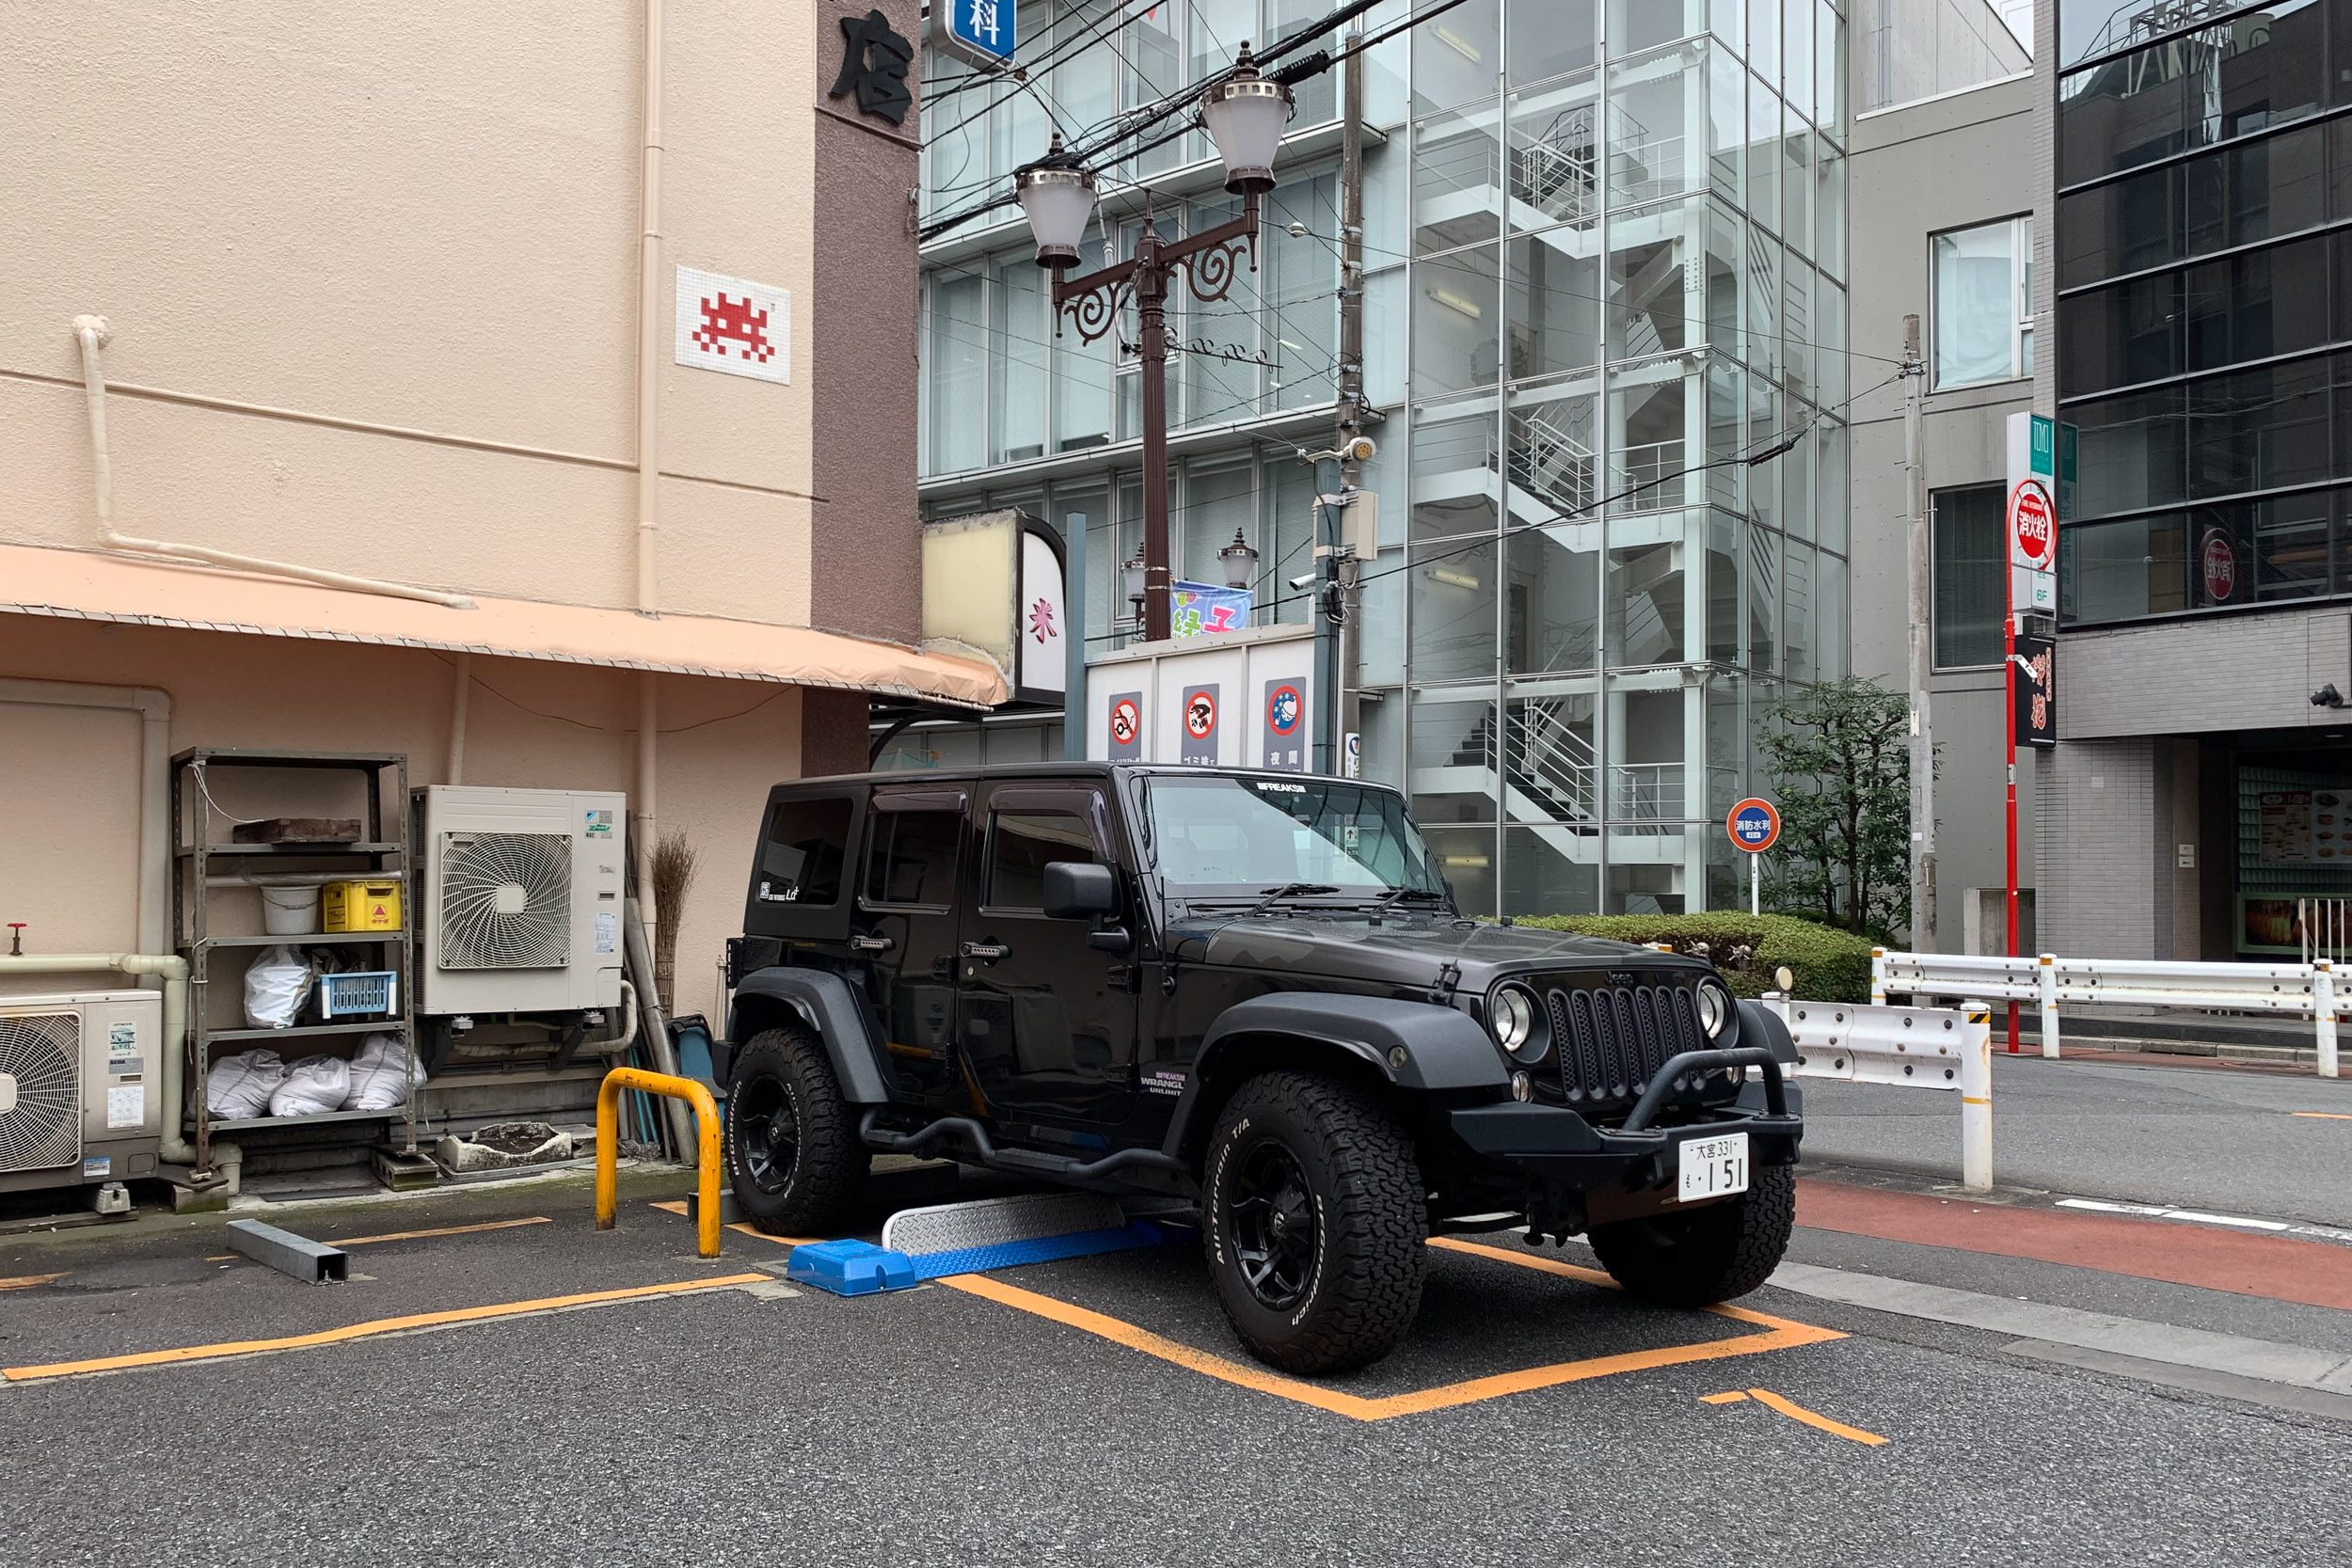 20190720-IMG_5944-japan-escape-iphone.jpg